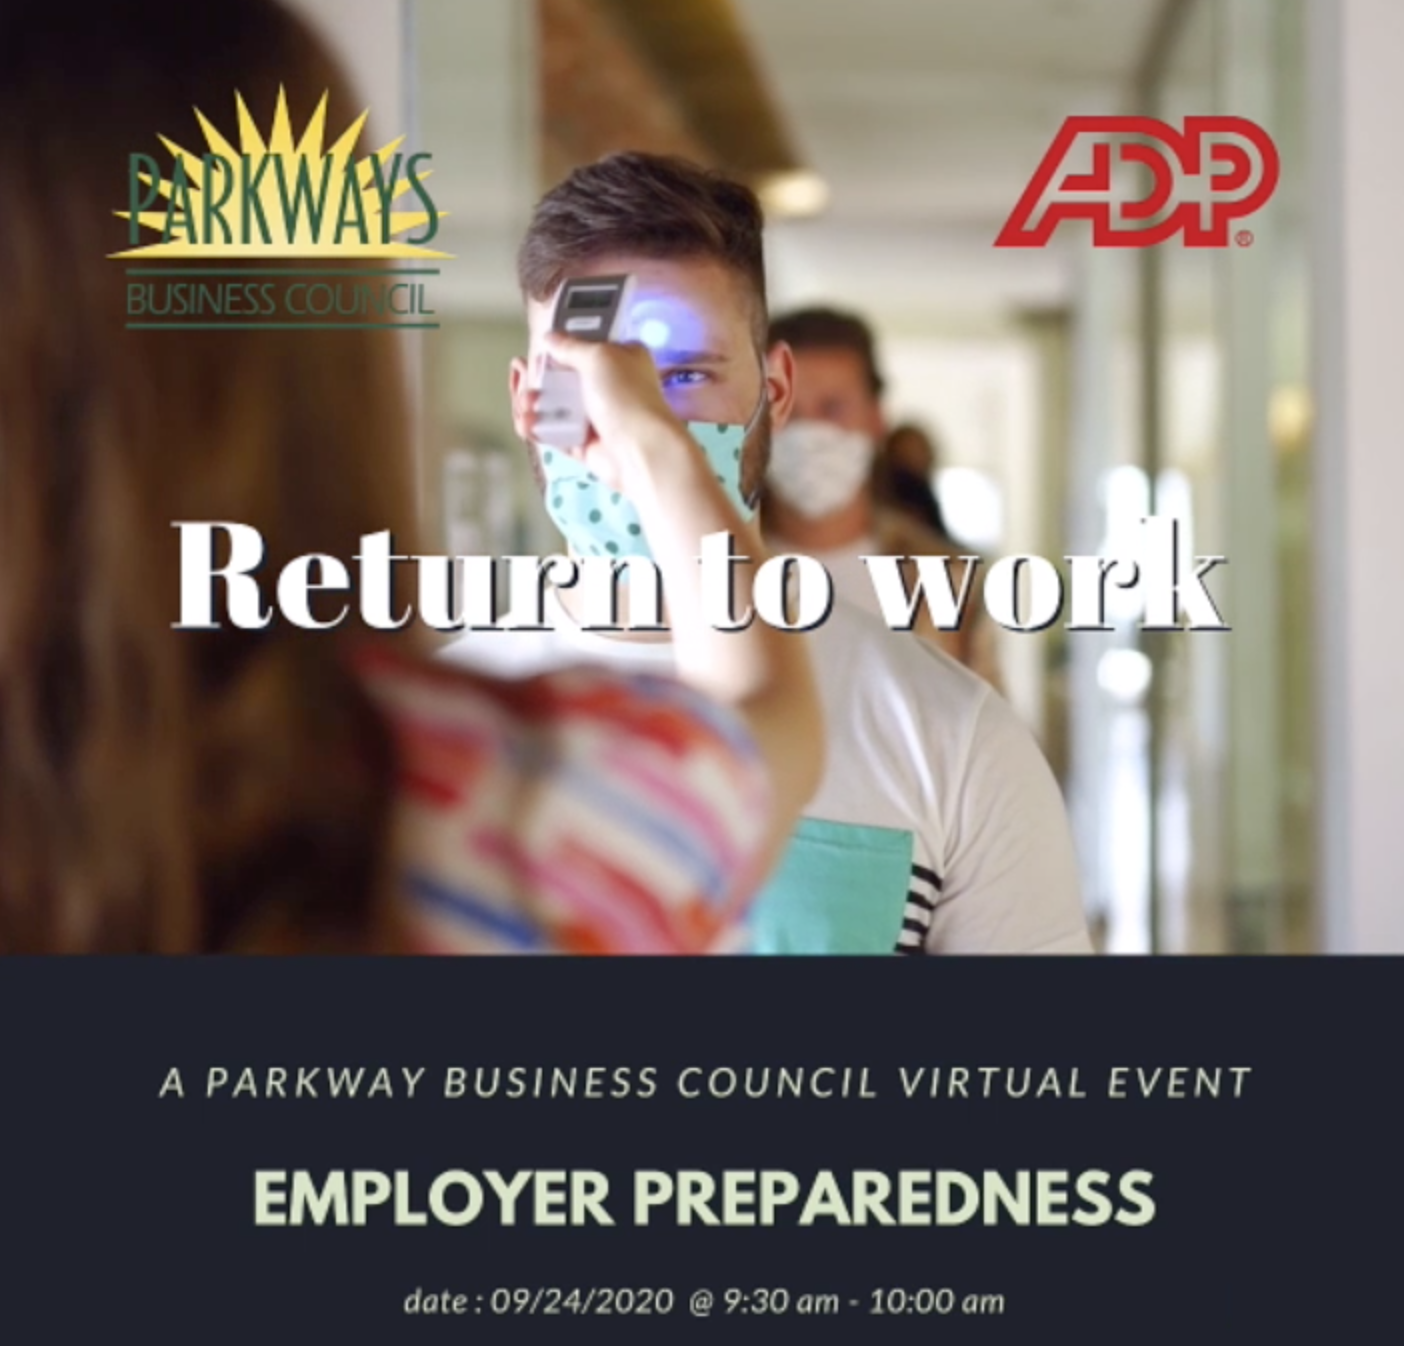 Parkways Business Council Presents Livestream On Return To Work Employer Preparedness.